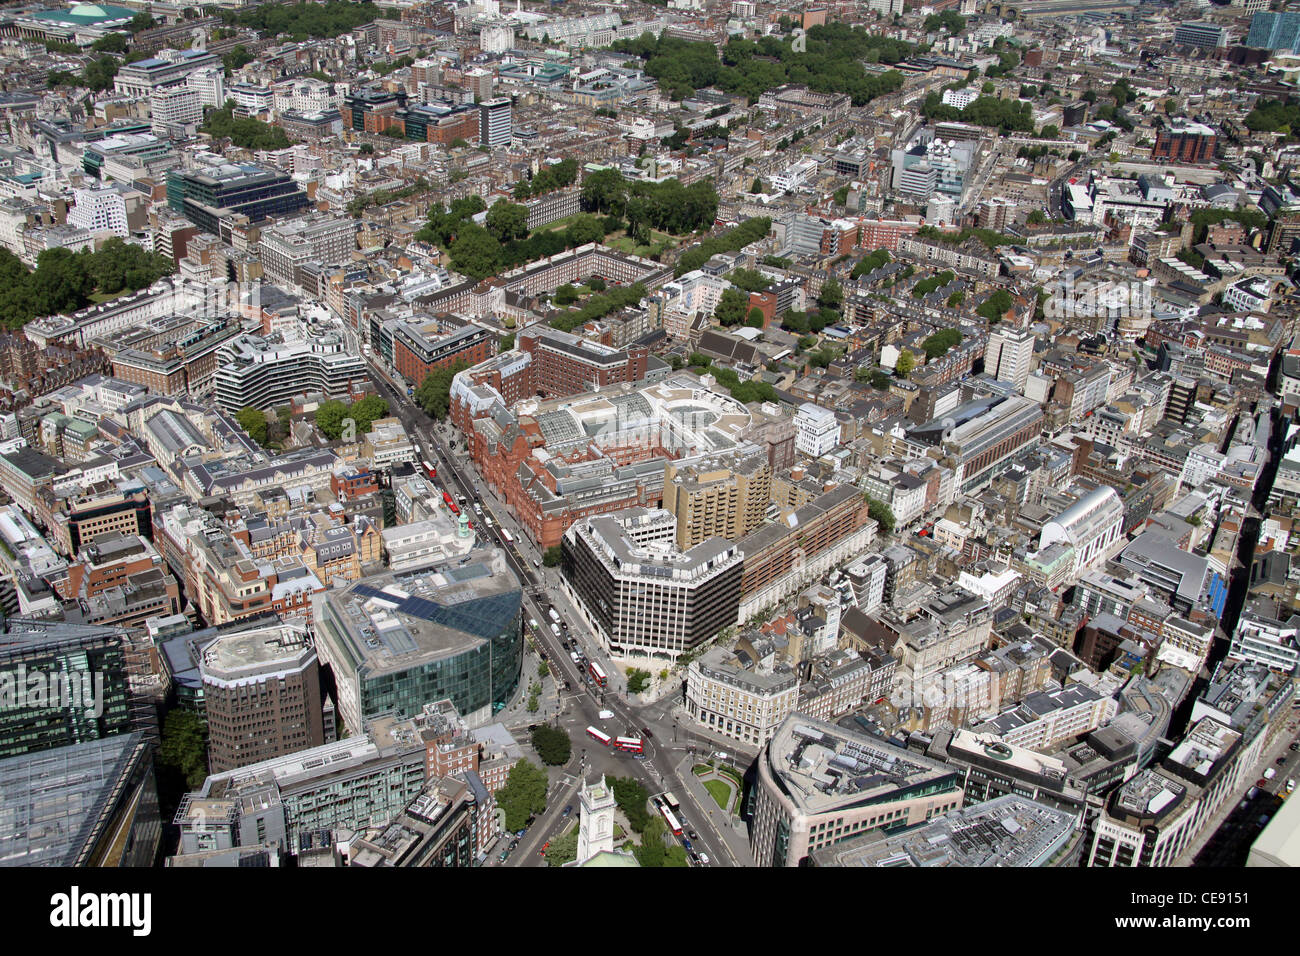 Aerial image of Holborn, London EC1 - Stock Image